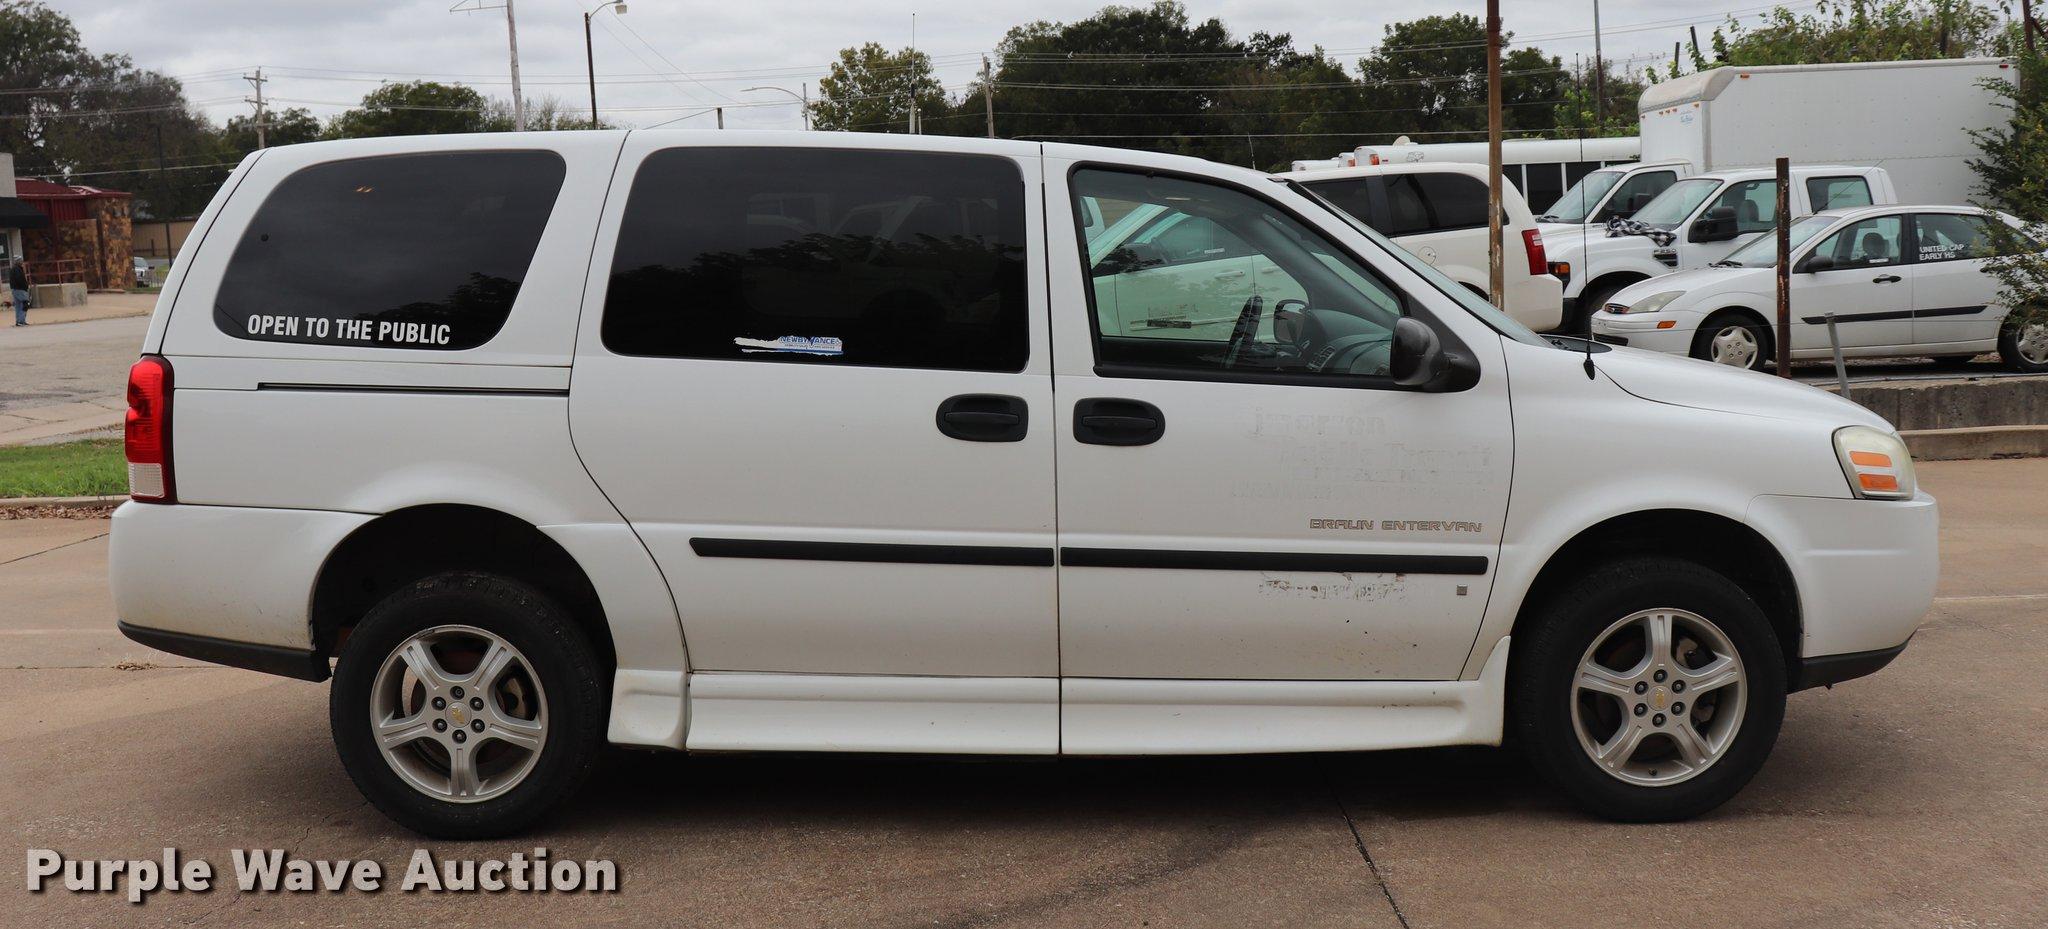 All Chevy 2008 chevy venture van : 2008 Chevrolet Uplander handicap accessible van | Item ED962...